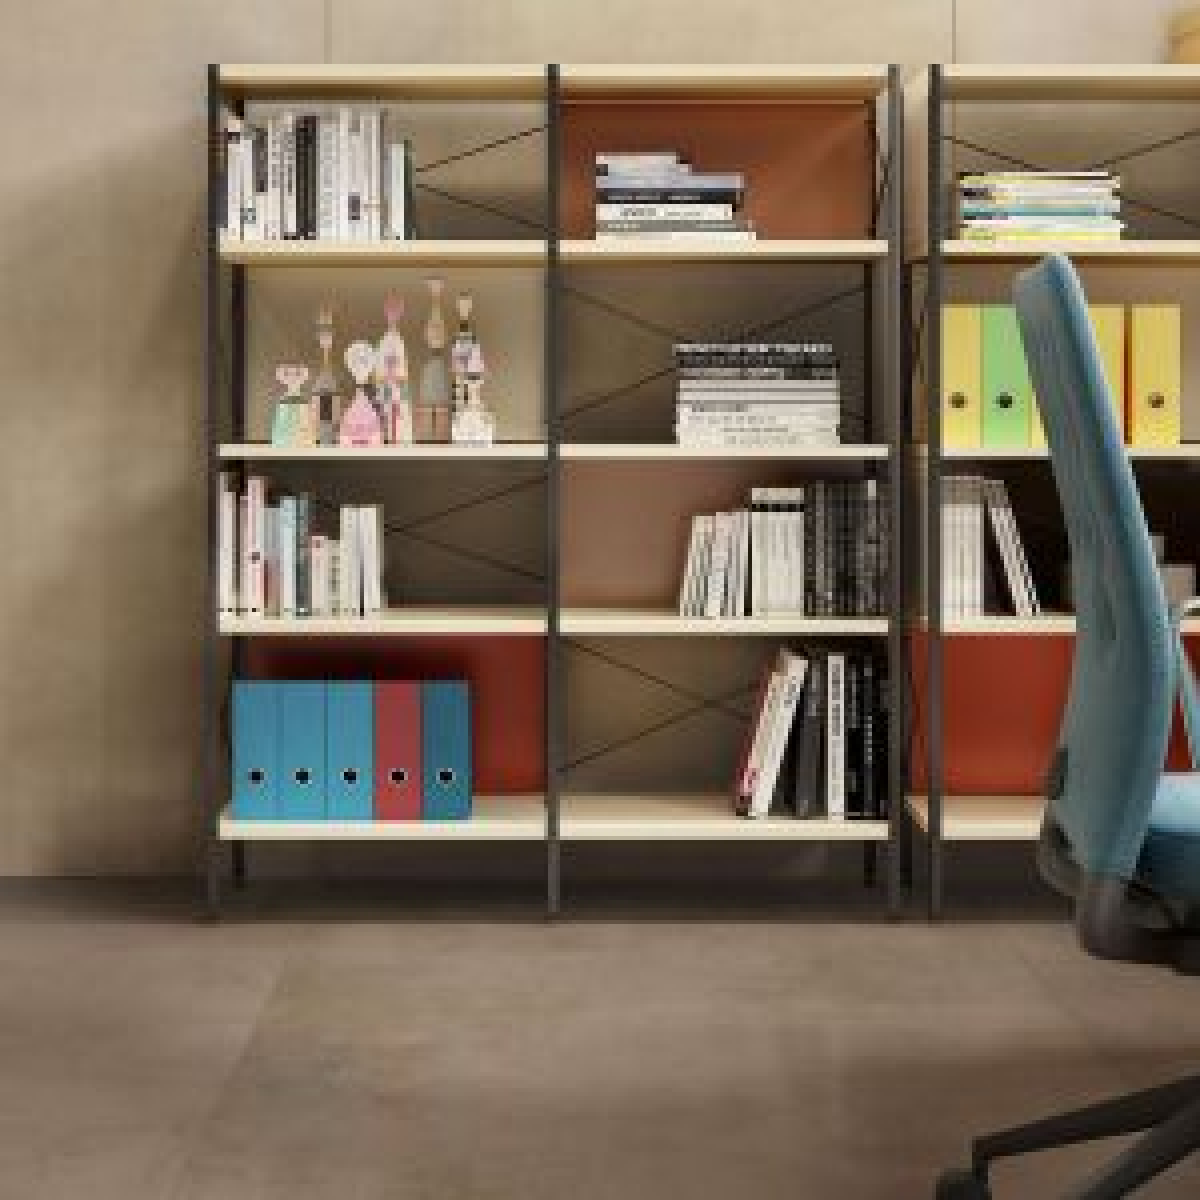 RAK Surface Charcoal Lappato Tile 600 x 1200mm Lifestyle